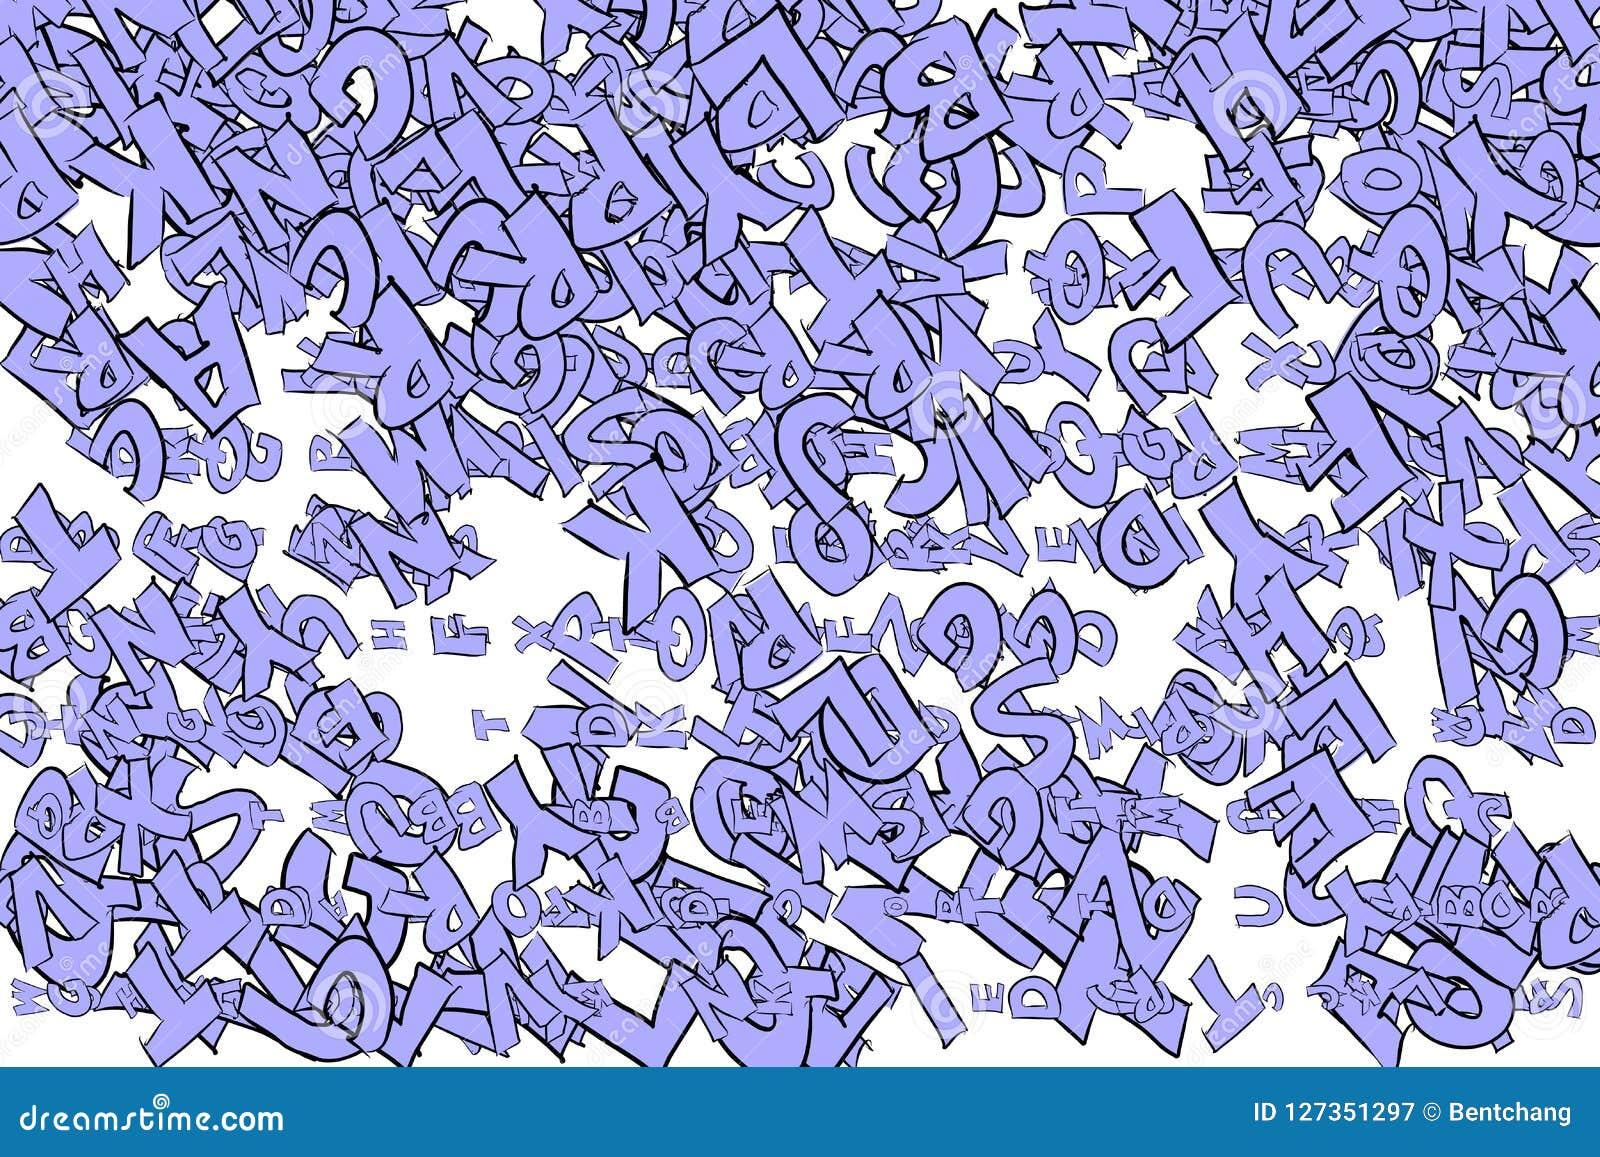 Illustrations Of Alphabets Letters Wallpaper Pattern